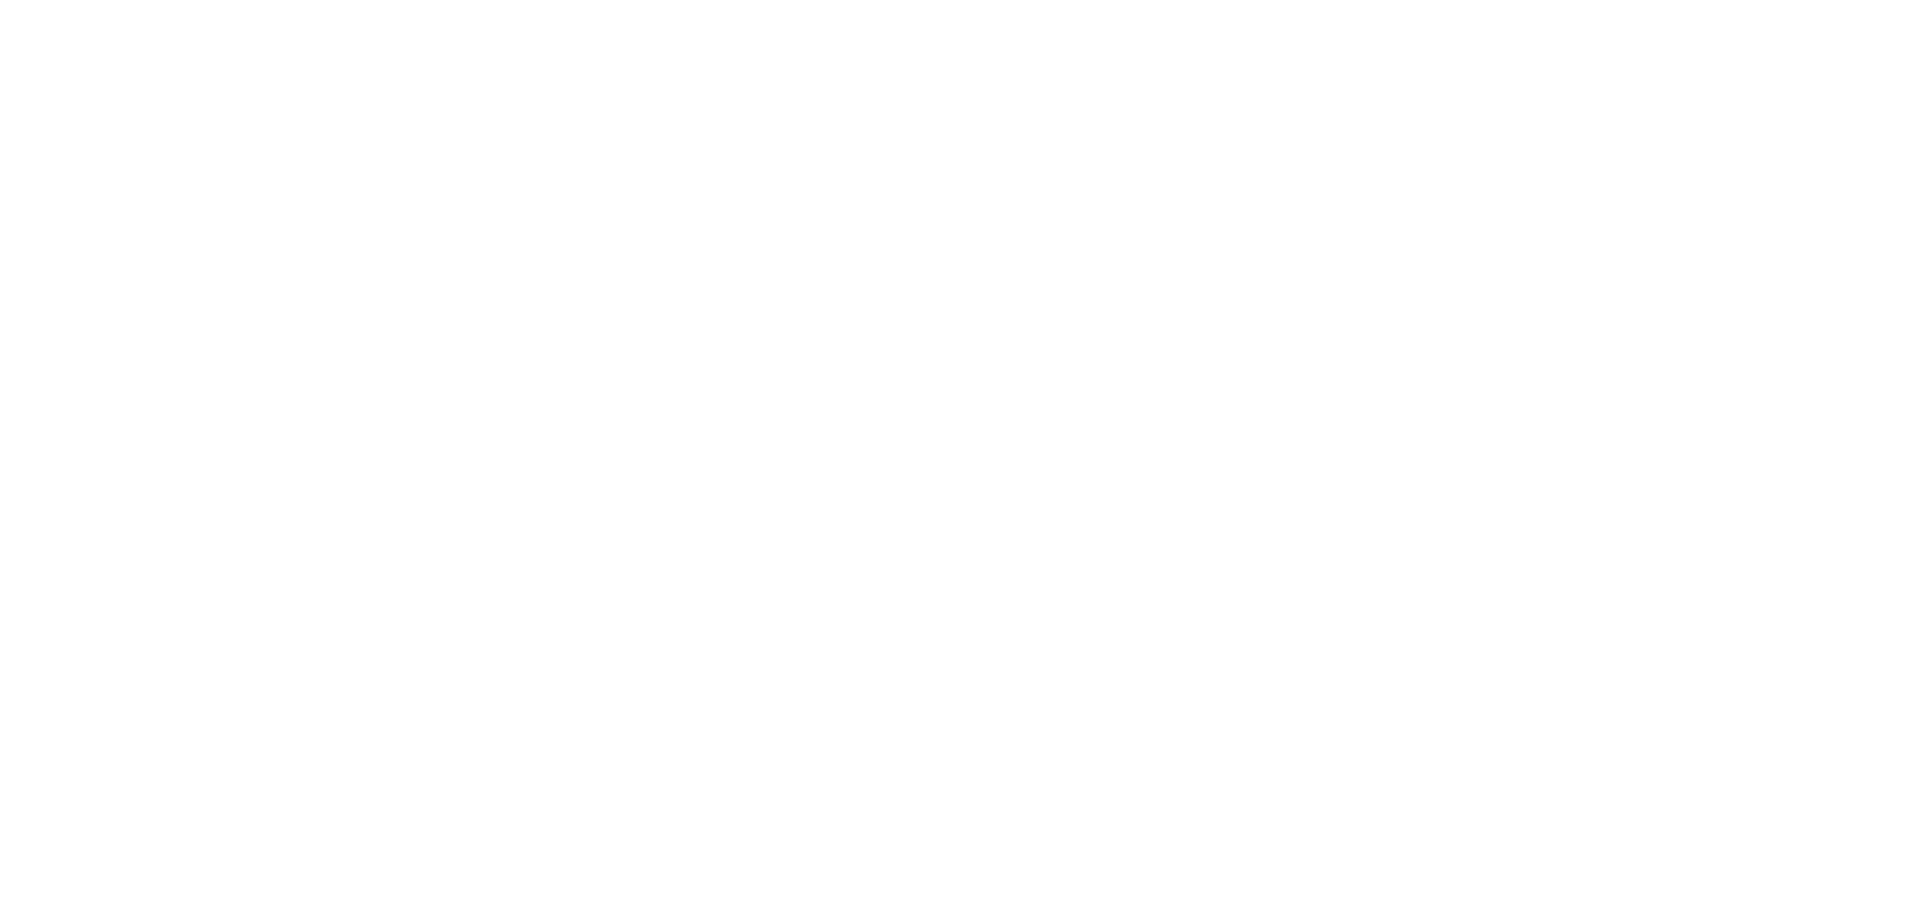 patternt